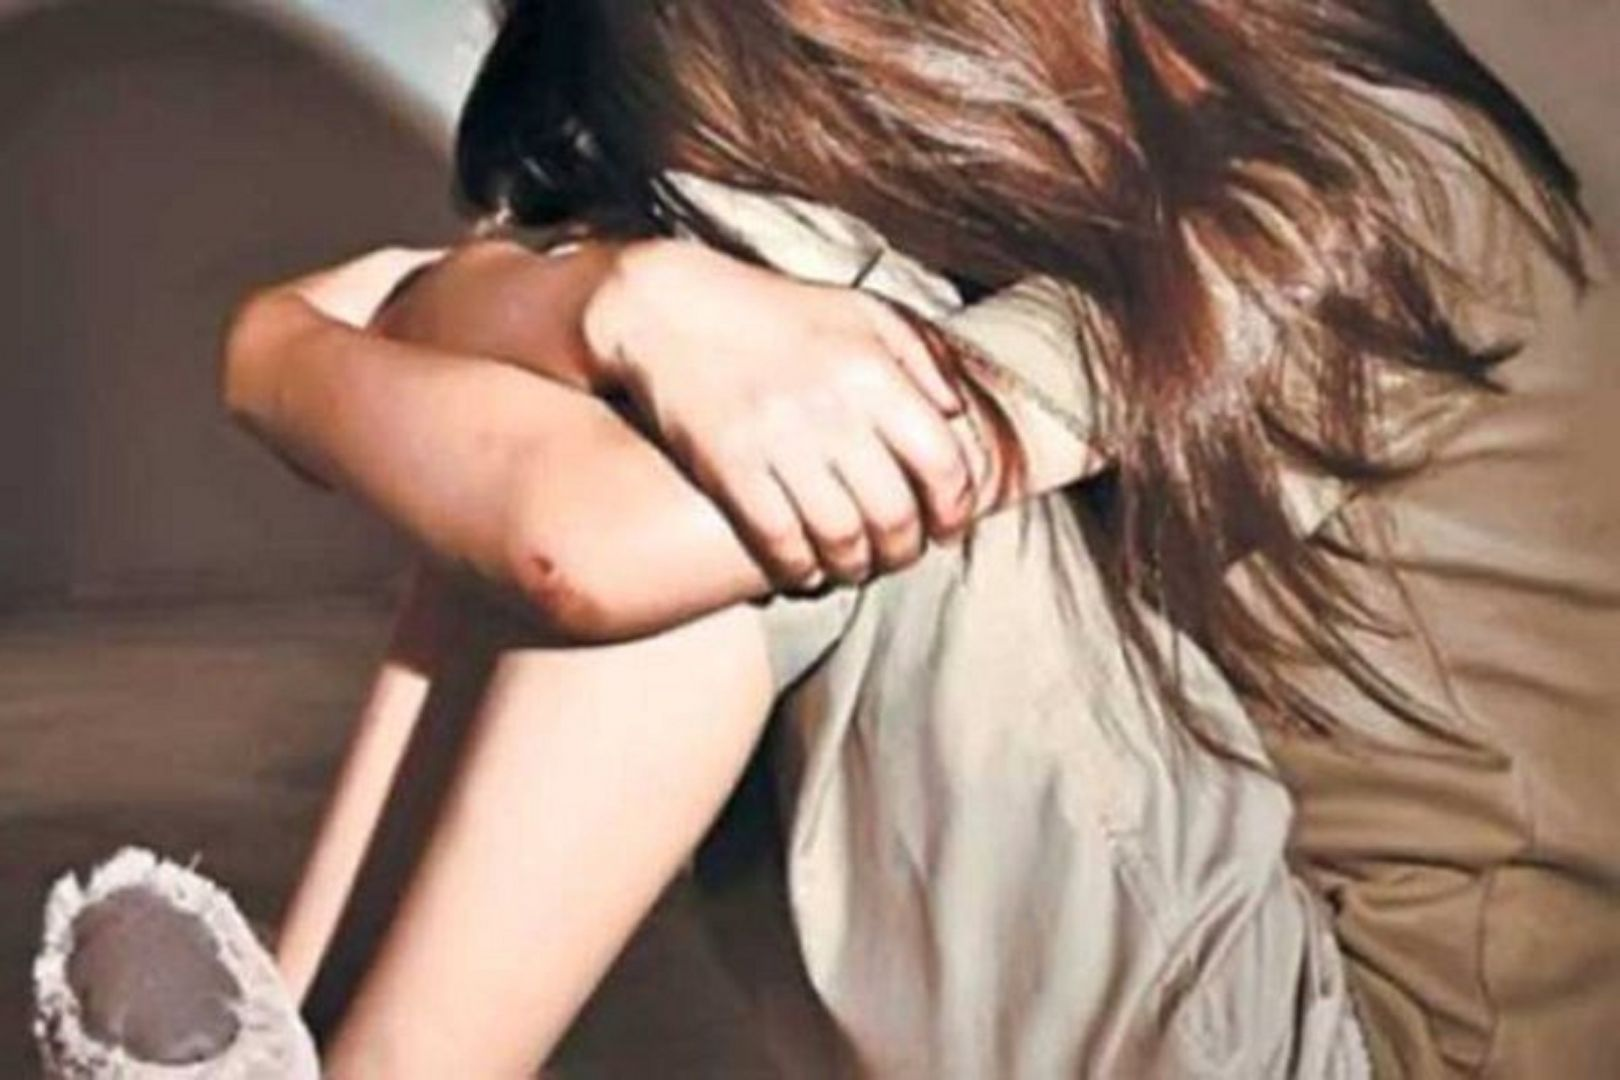 НаСтаврополье мужчину подозревали вразвращении девушки